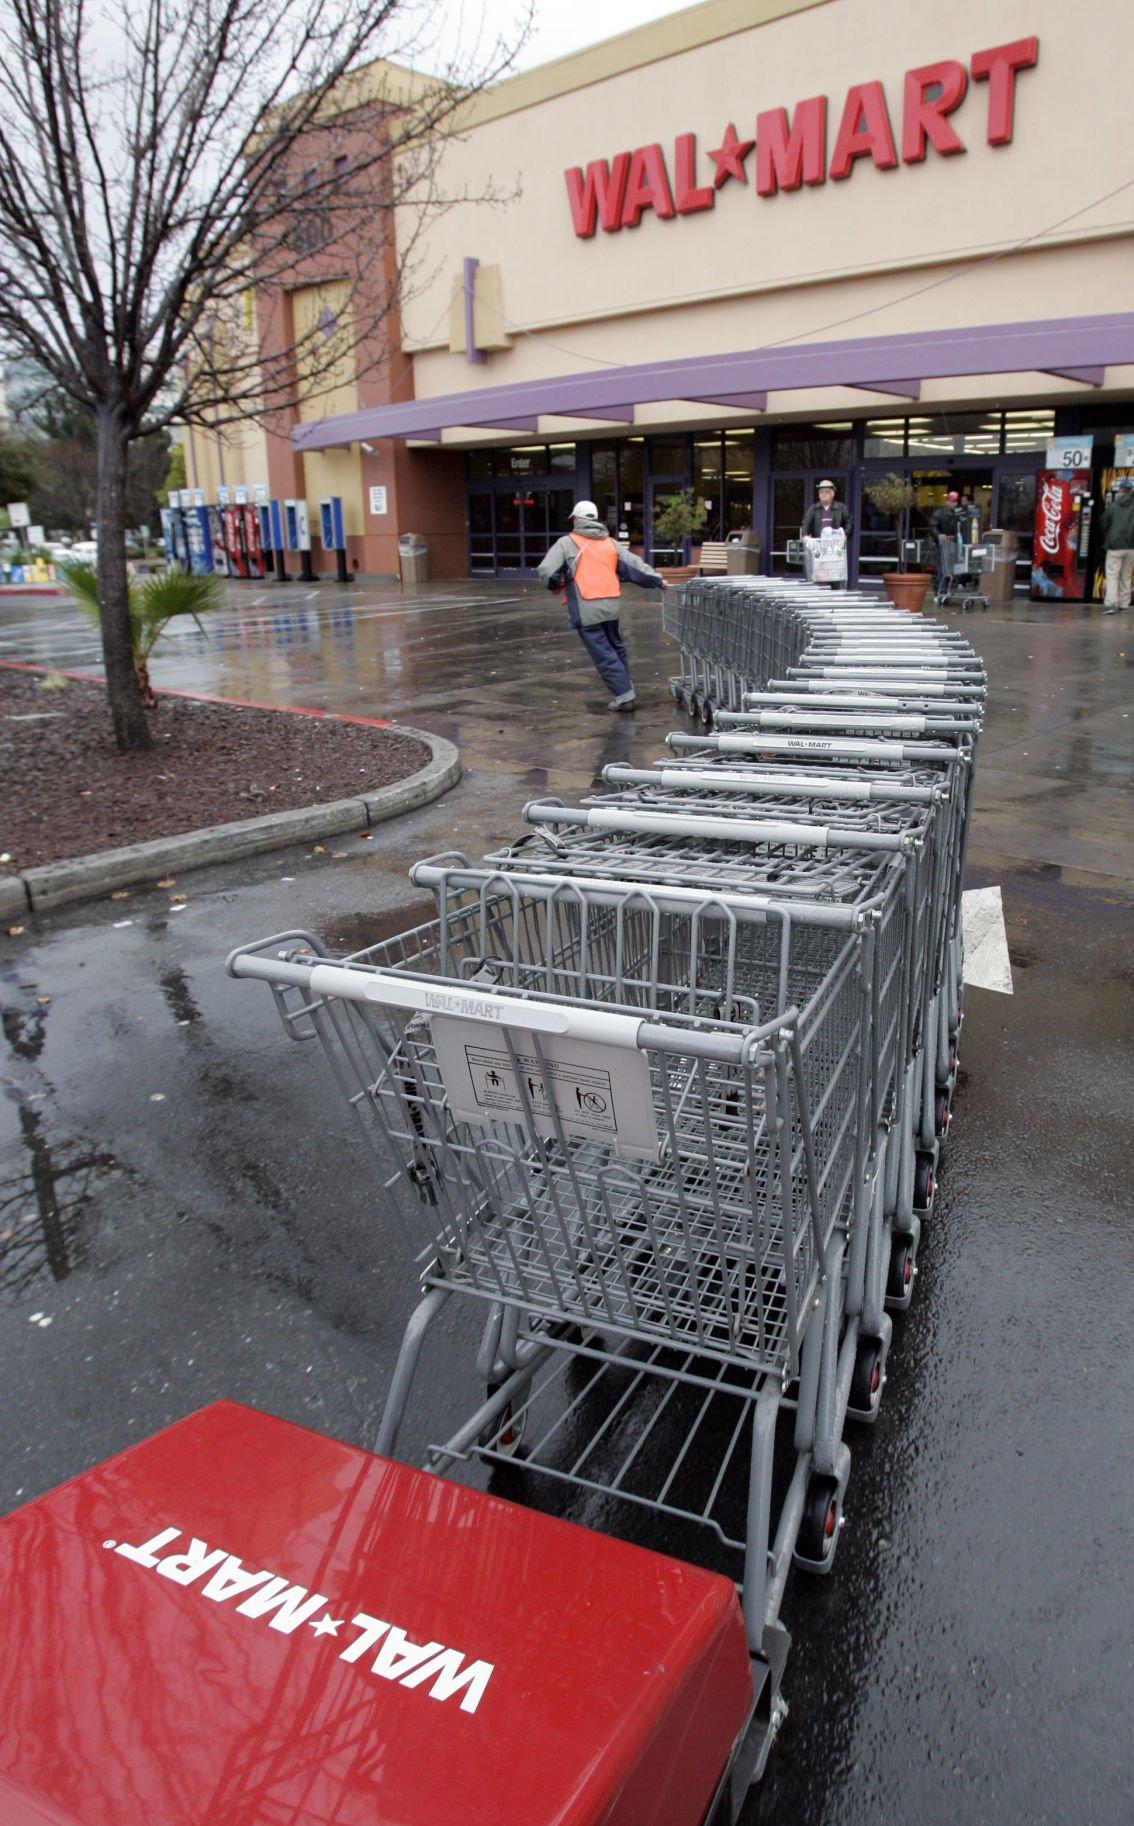 Wal-Mart's holiday hiring to be up slightly